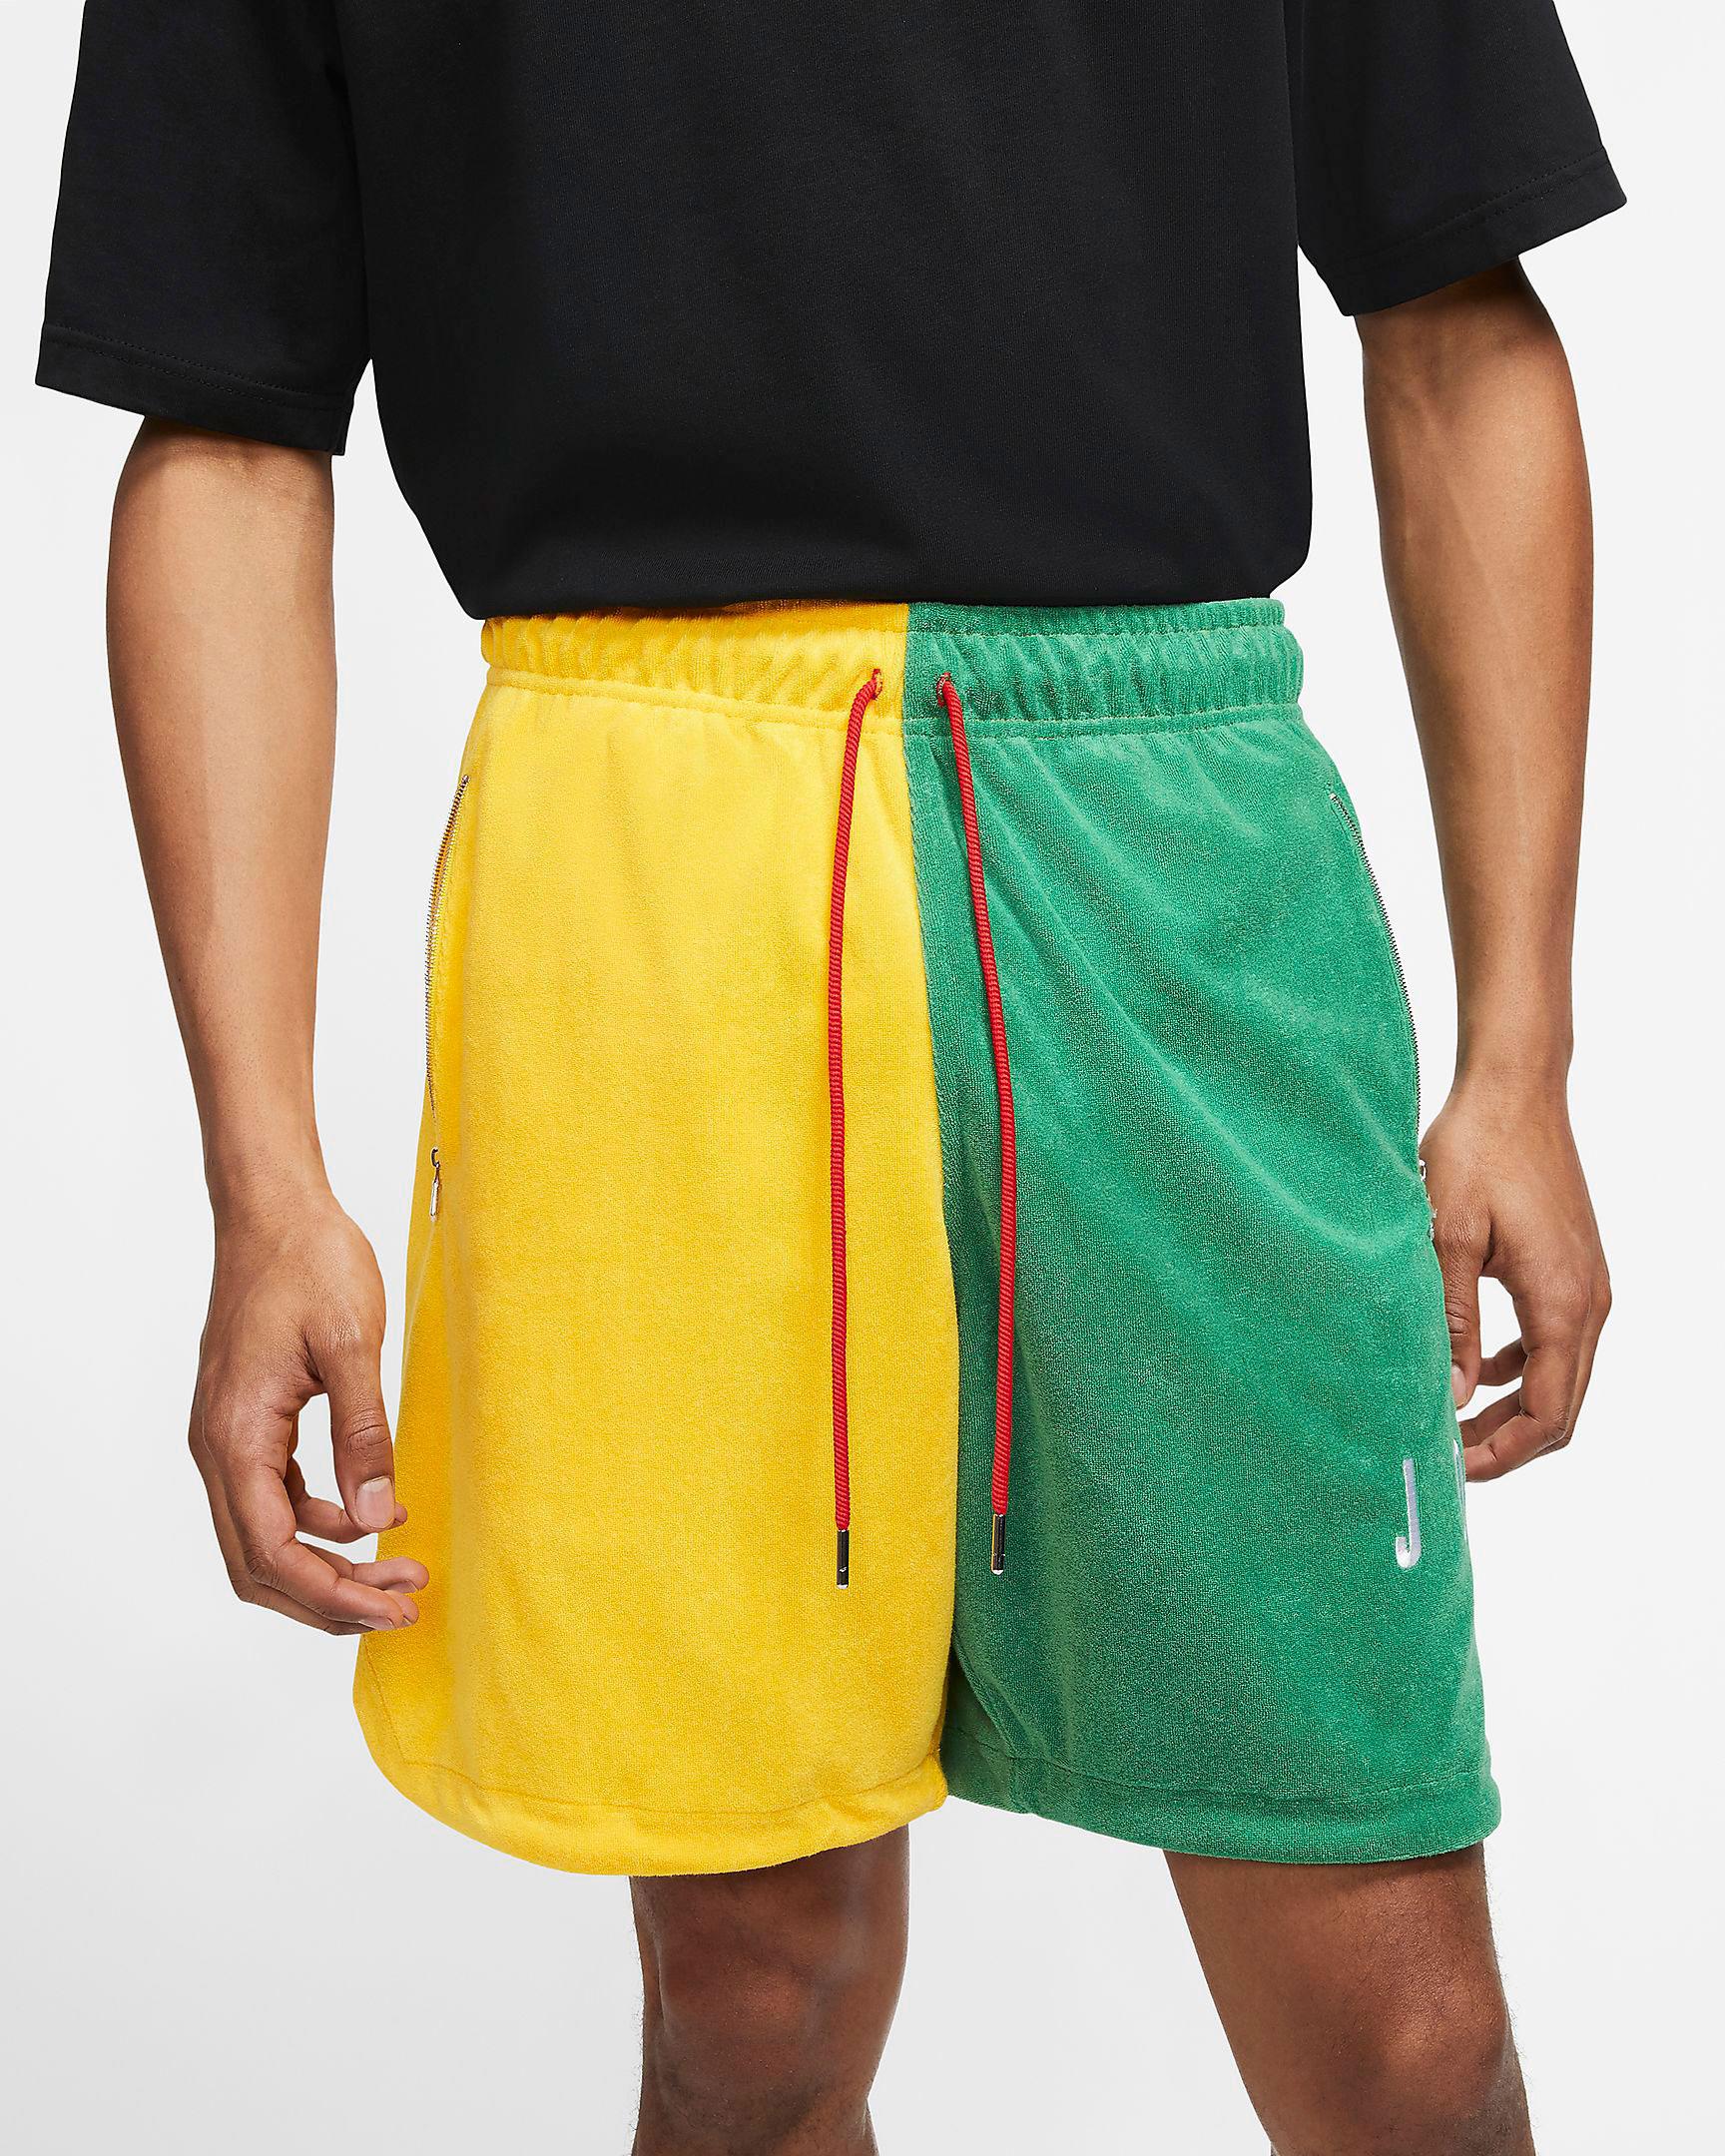 air-jordan-5-oregon-ducks-shorts-to-match-1